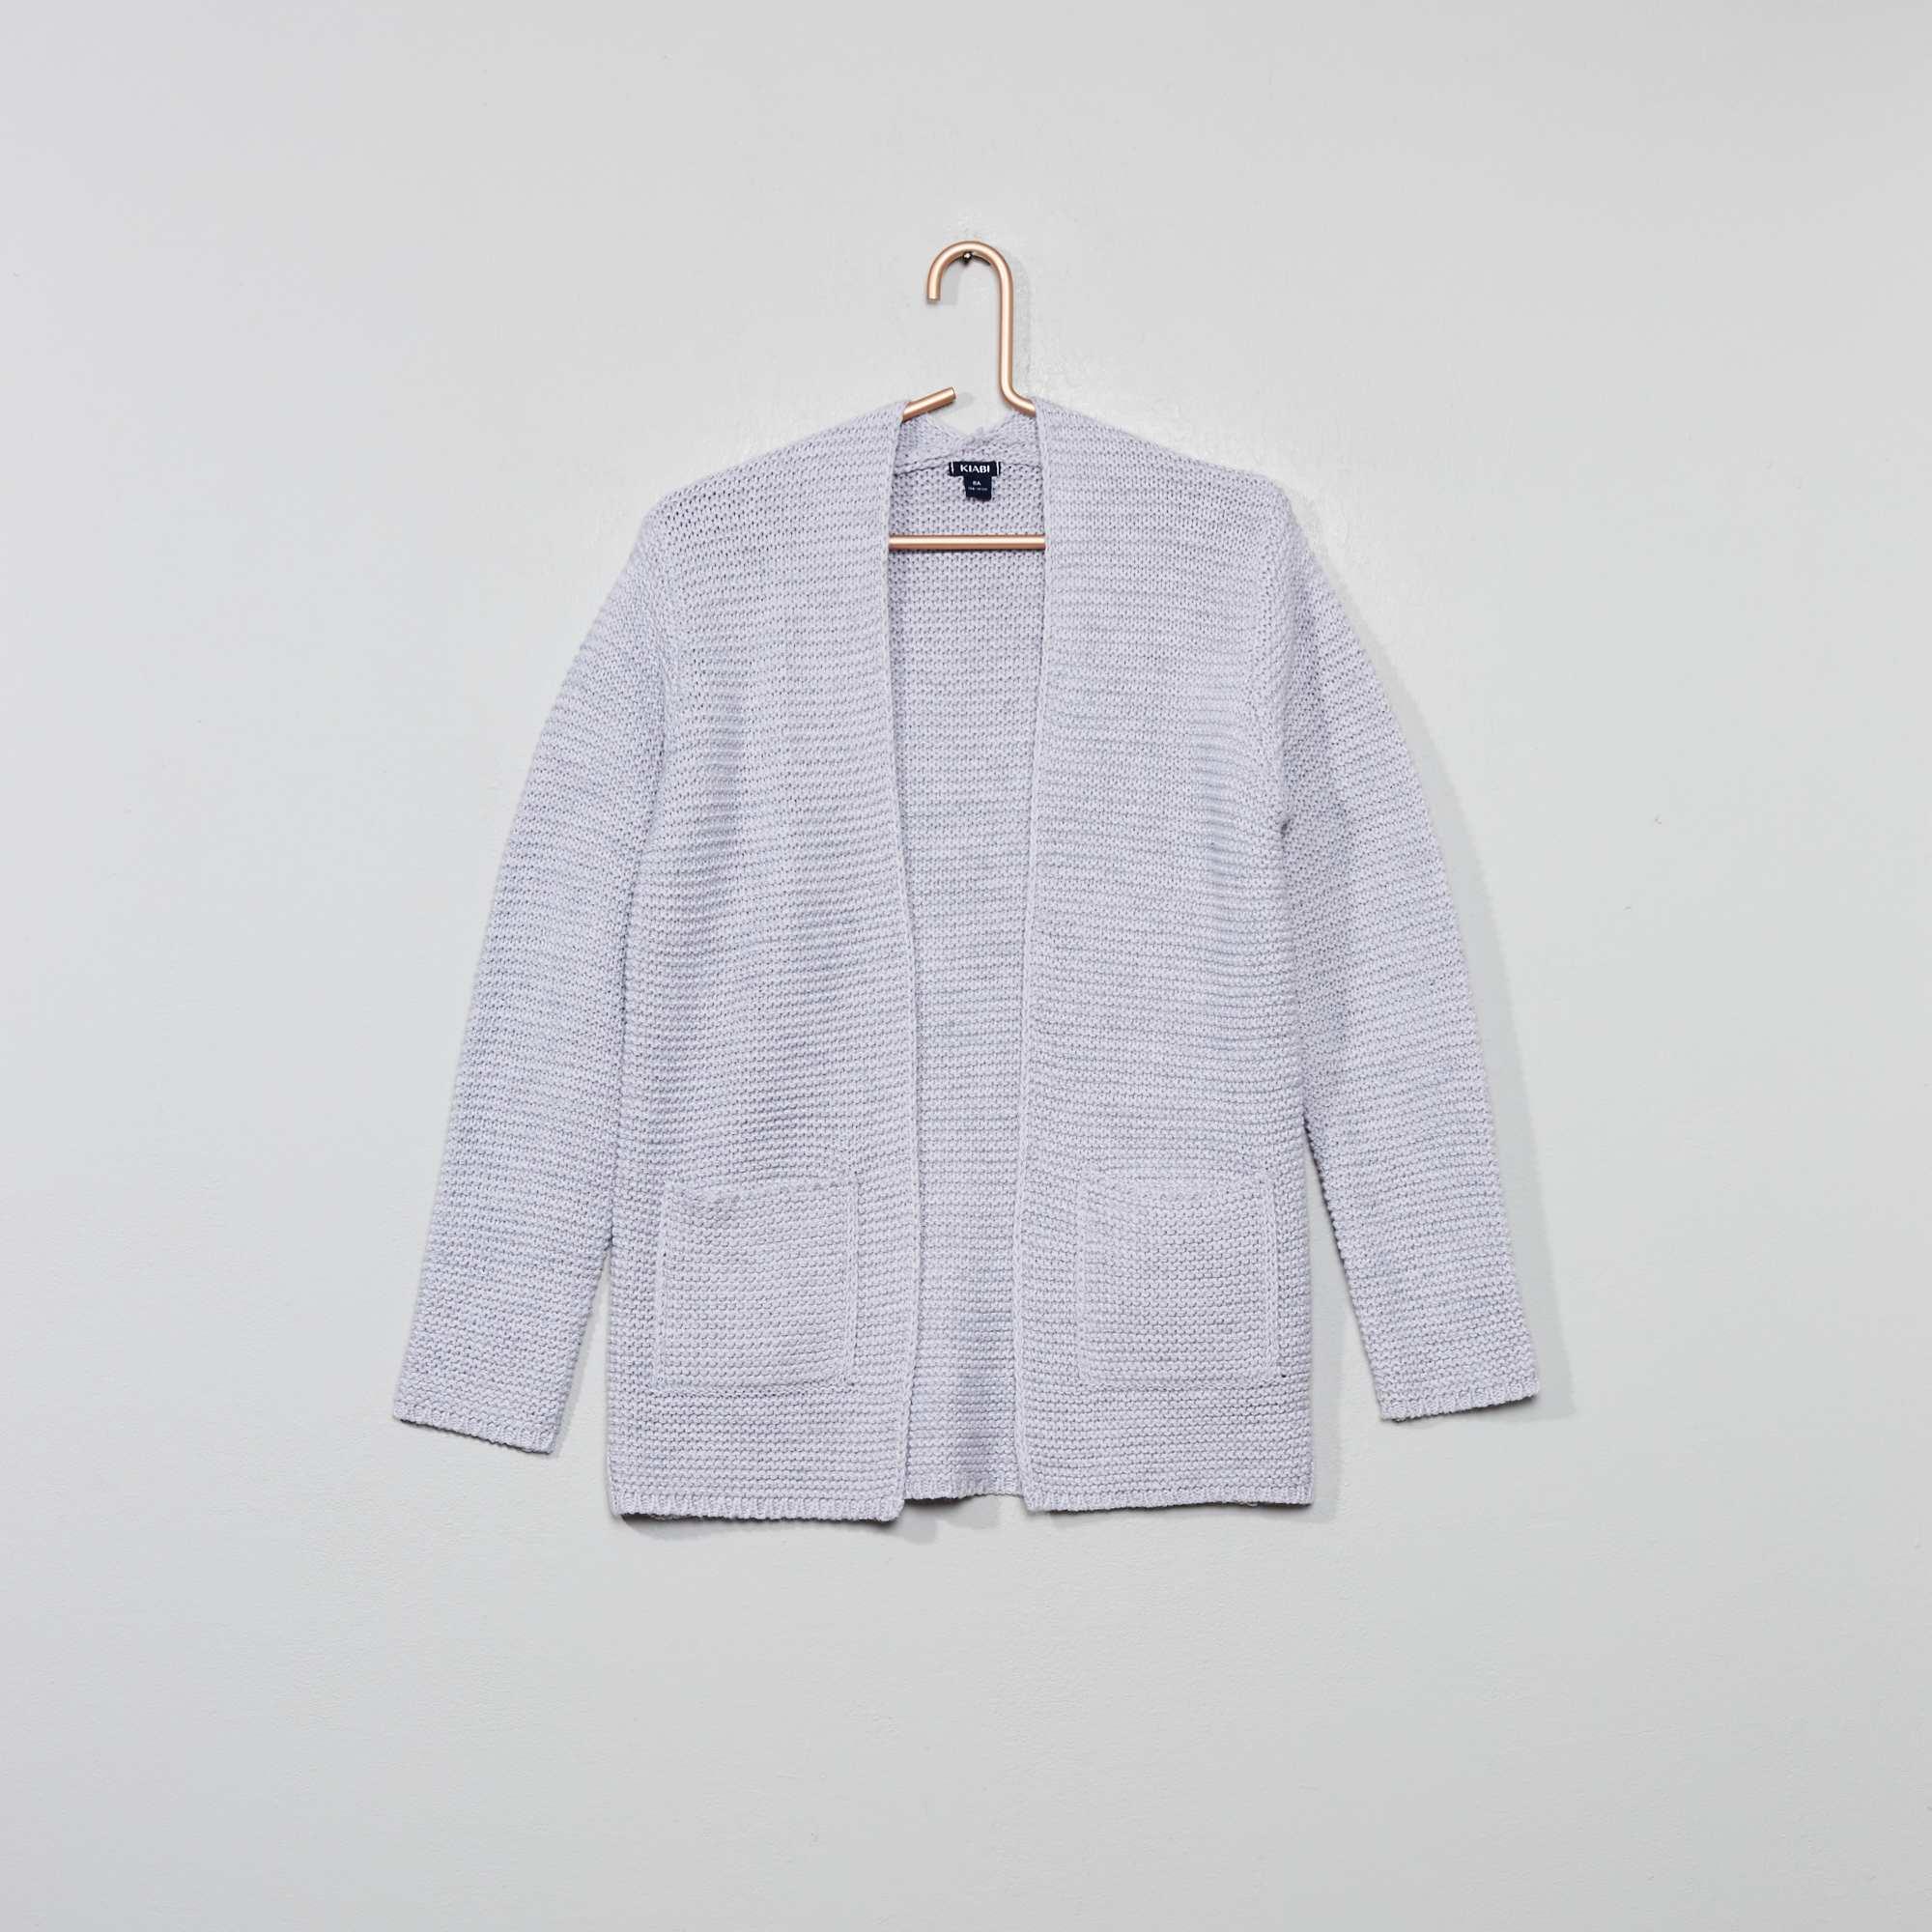 Casaco, casaco de inverno Bebê | tamanho 12m | Kiabi